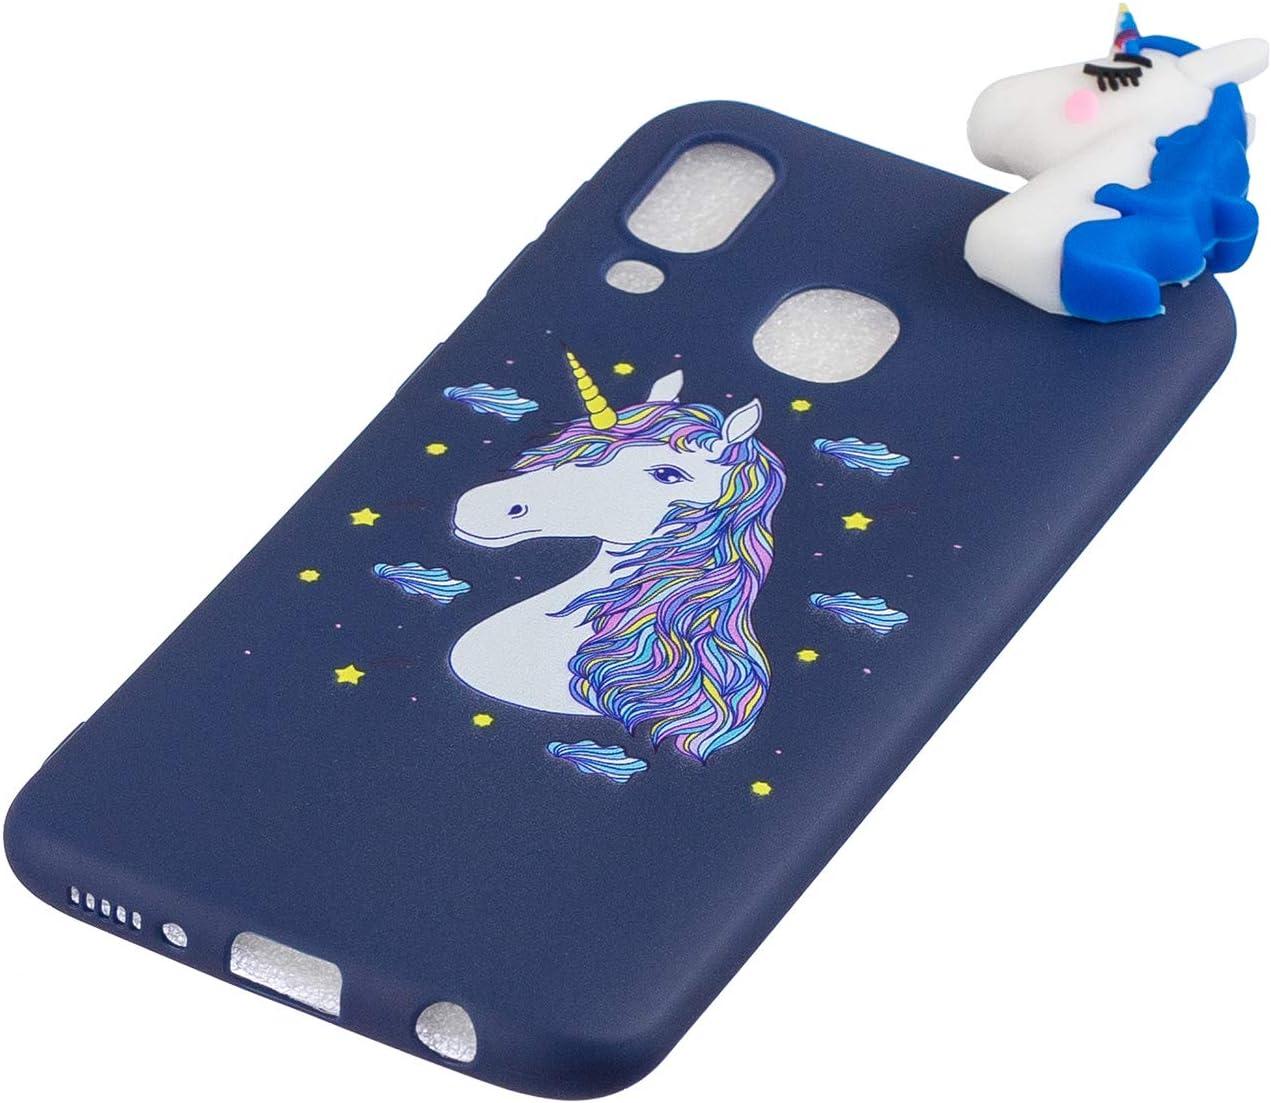 HUDDU Handyh/ülle Kompatibel mit Samsung Galaxy A40 H/ülle Silikon Ultra D/ünn Bumper Durchsichtig Case mit Motiv H/üllen Kawaii Muster Design Slim Cover Handytasche 3D Bunte Schutzh/ülle Etui 8 Schwein